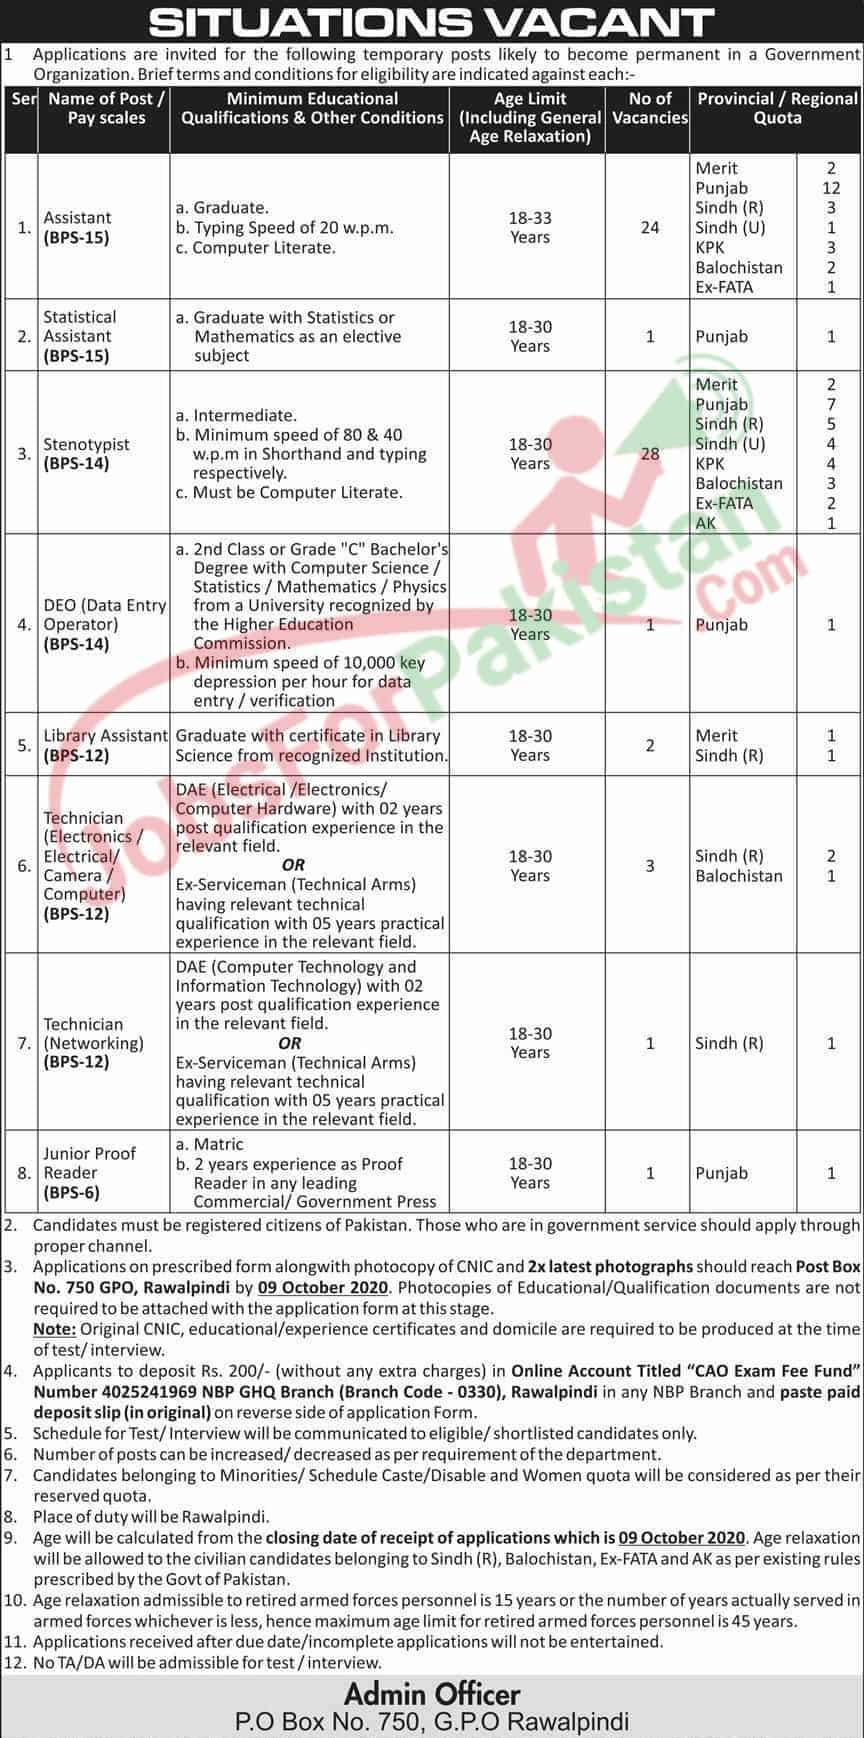 Official GHQ Rawalpindi Vacancies Advertisement